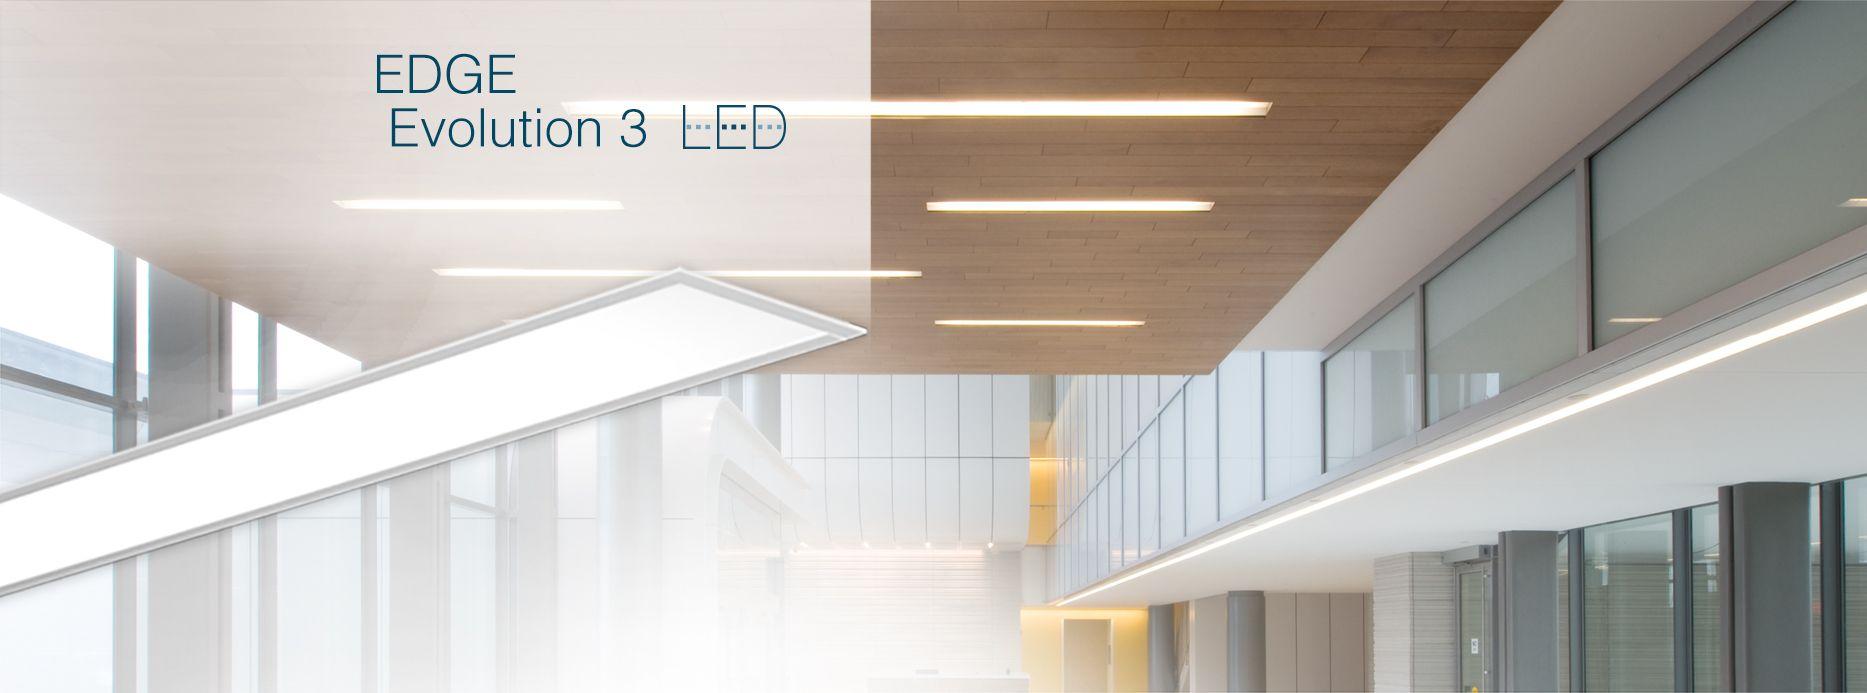 pinnacle architectural lighting edge evolution 3 led lighting